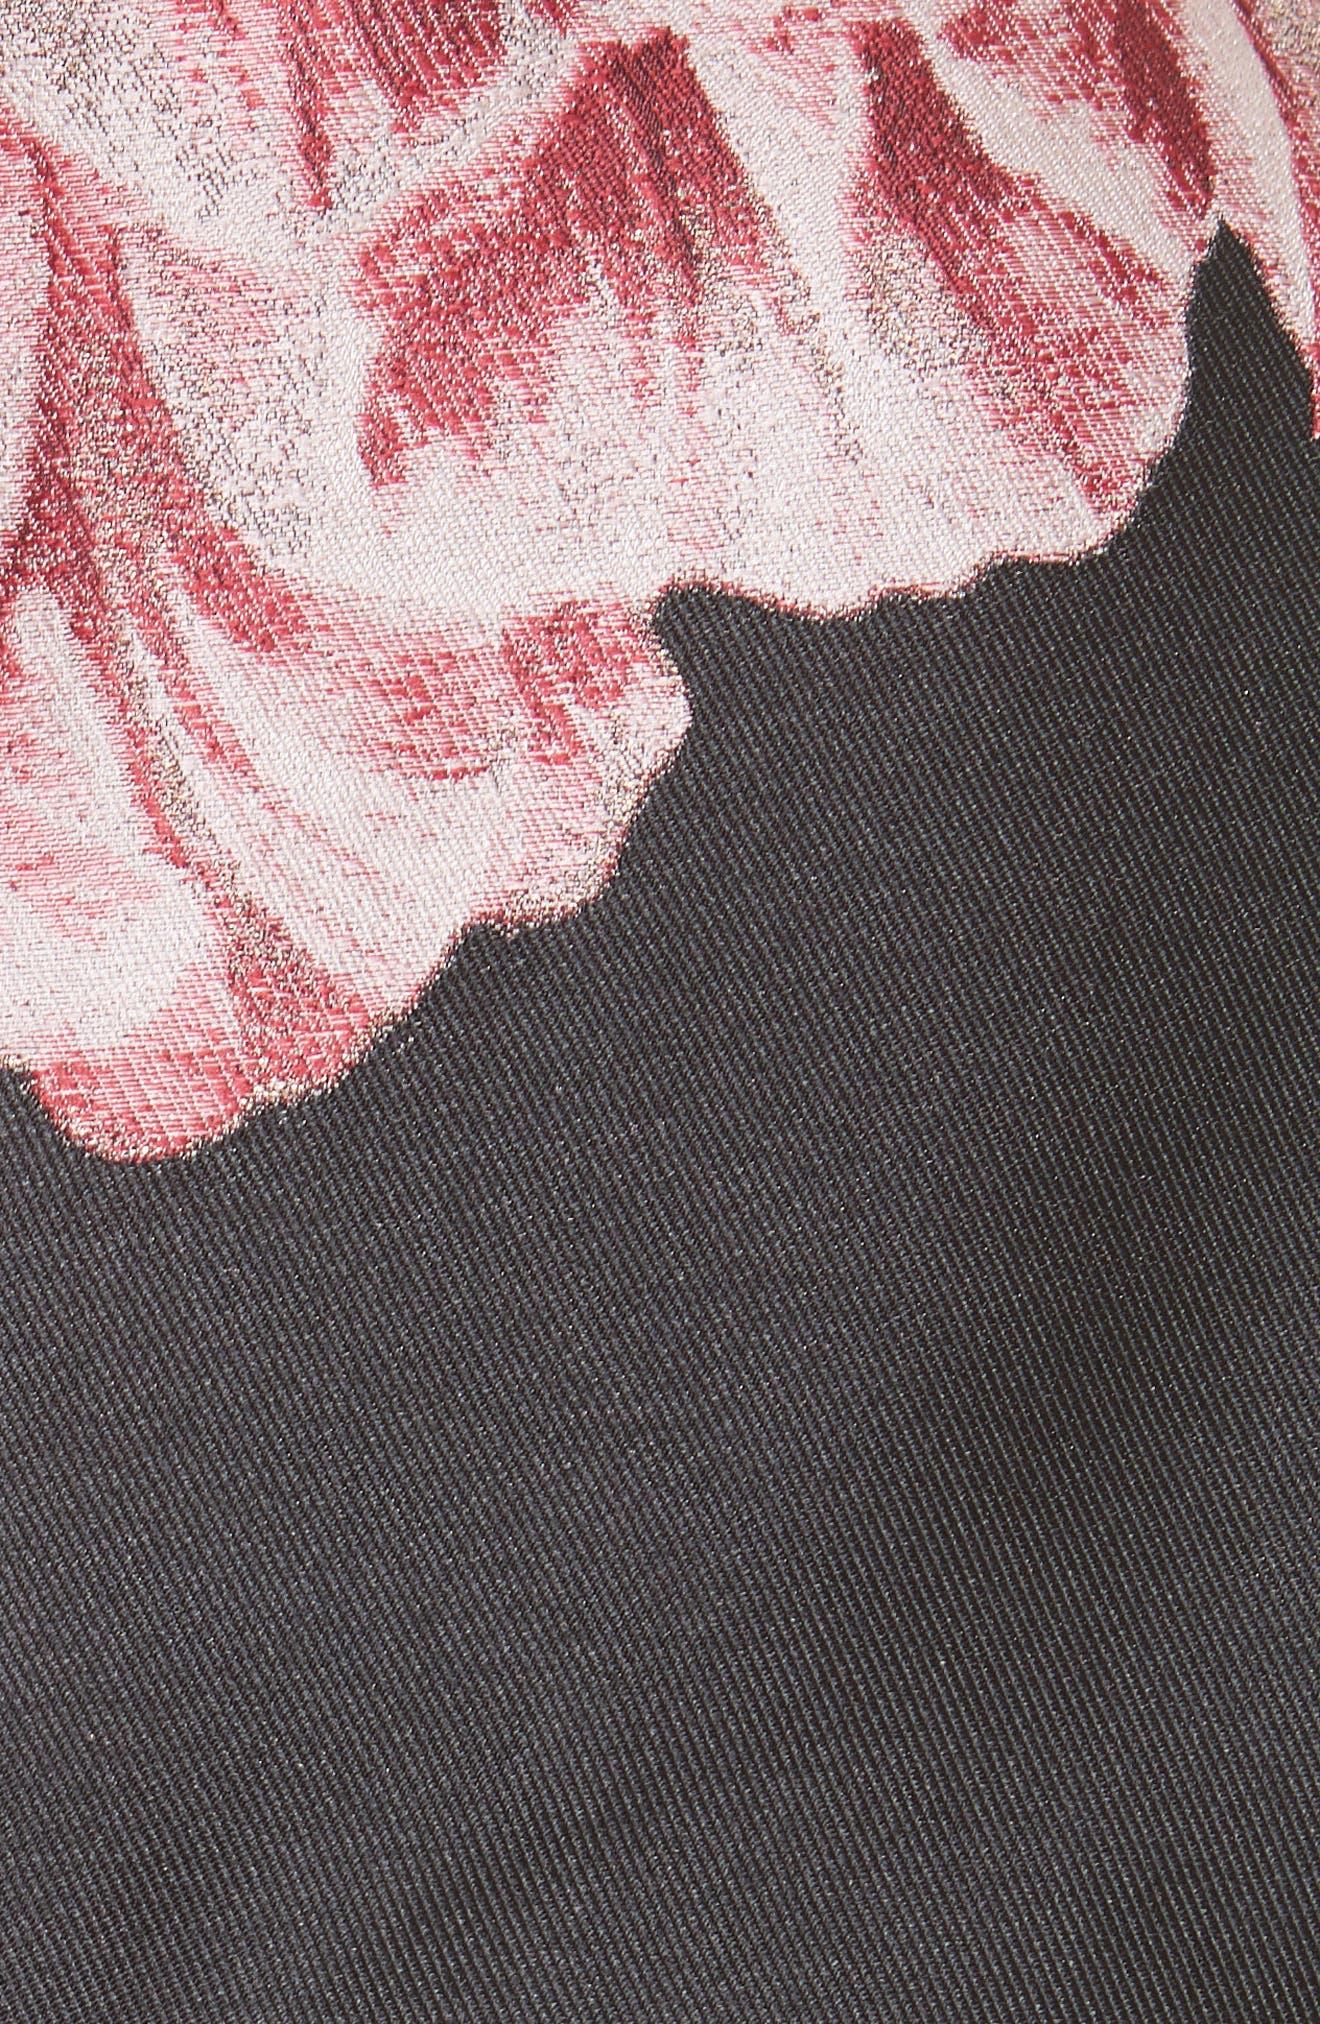 Eyvii Bay of Honour Asymmetrical Dress,                             Alternate thumbnail 5, color,                             Black